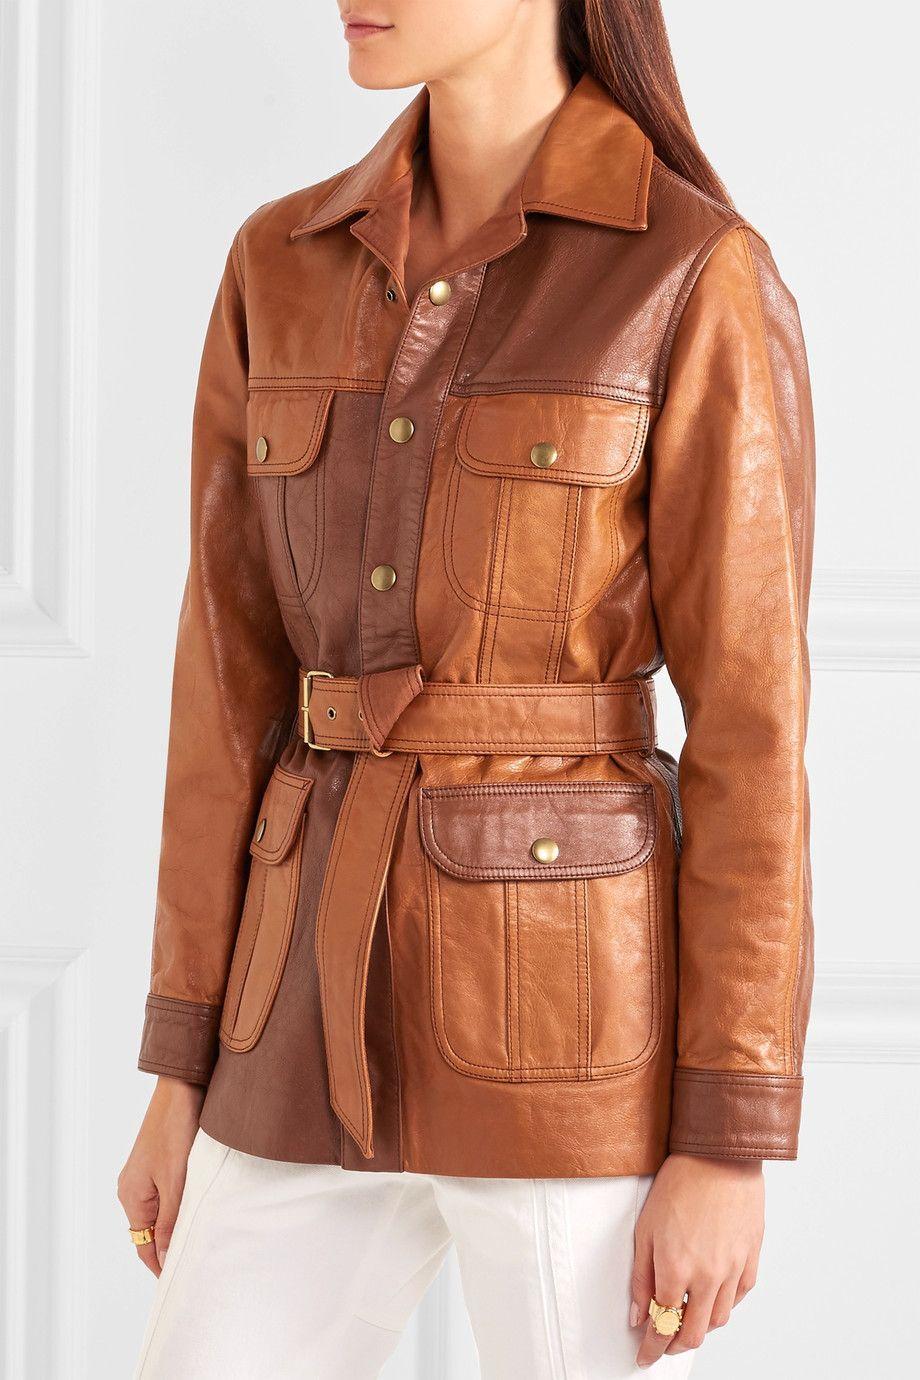 Chloe Belted Leather Jacket Tan Leather Jackets Leather Jacket Jackets [ 1380 x 920 Pixel ]